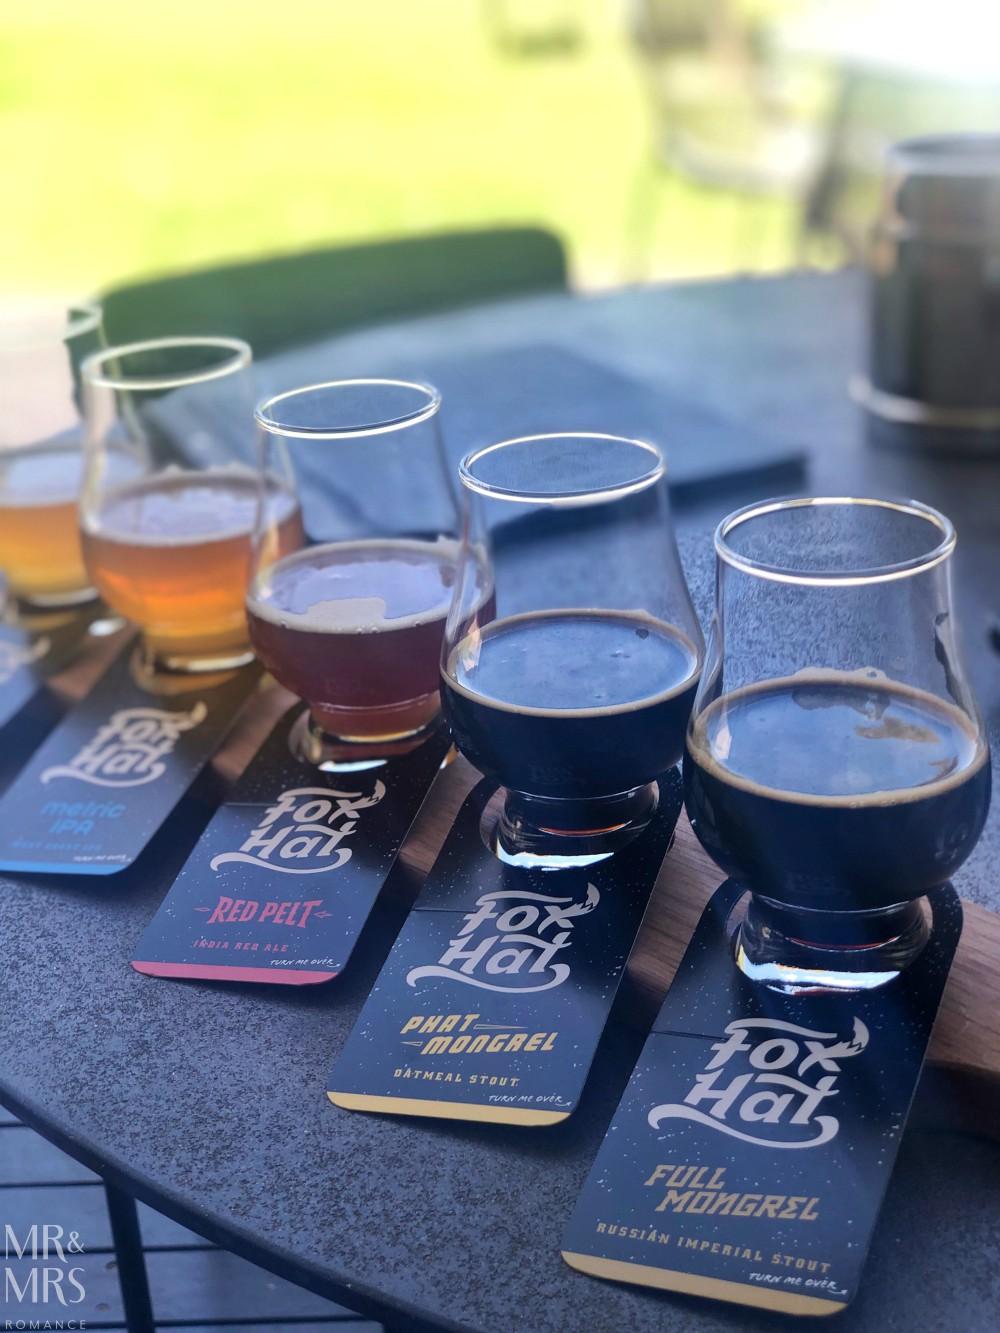 Fox Hat beer tasting Beresford, McLaren Vale, Adelaide